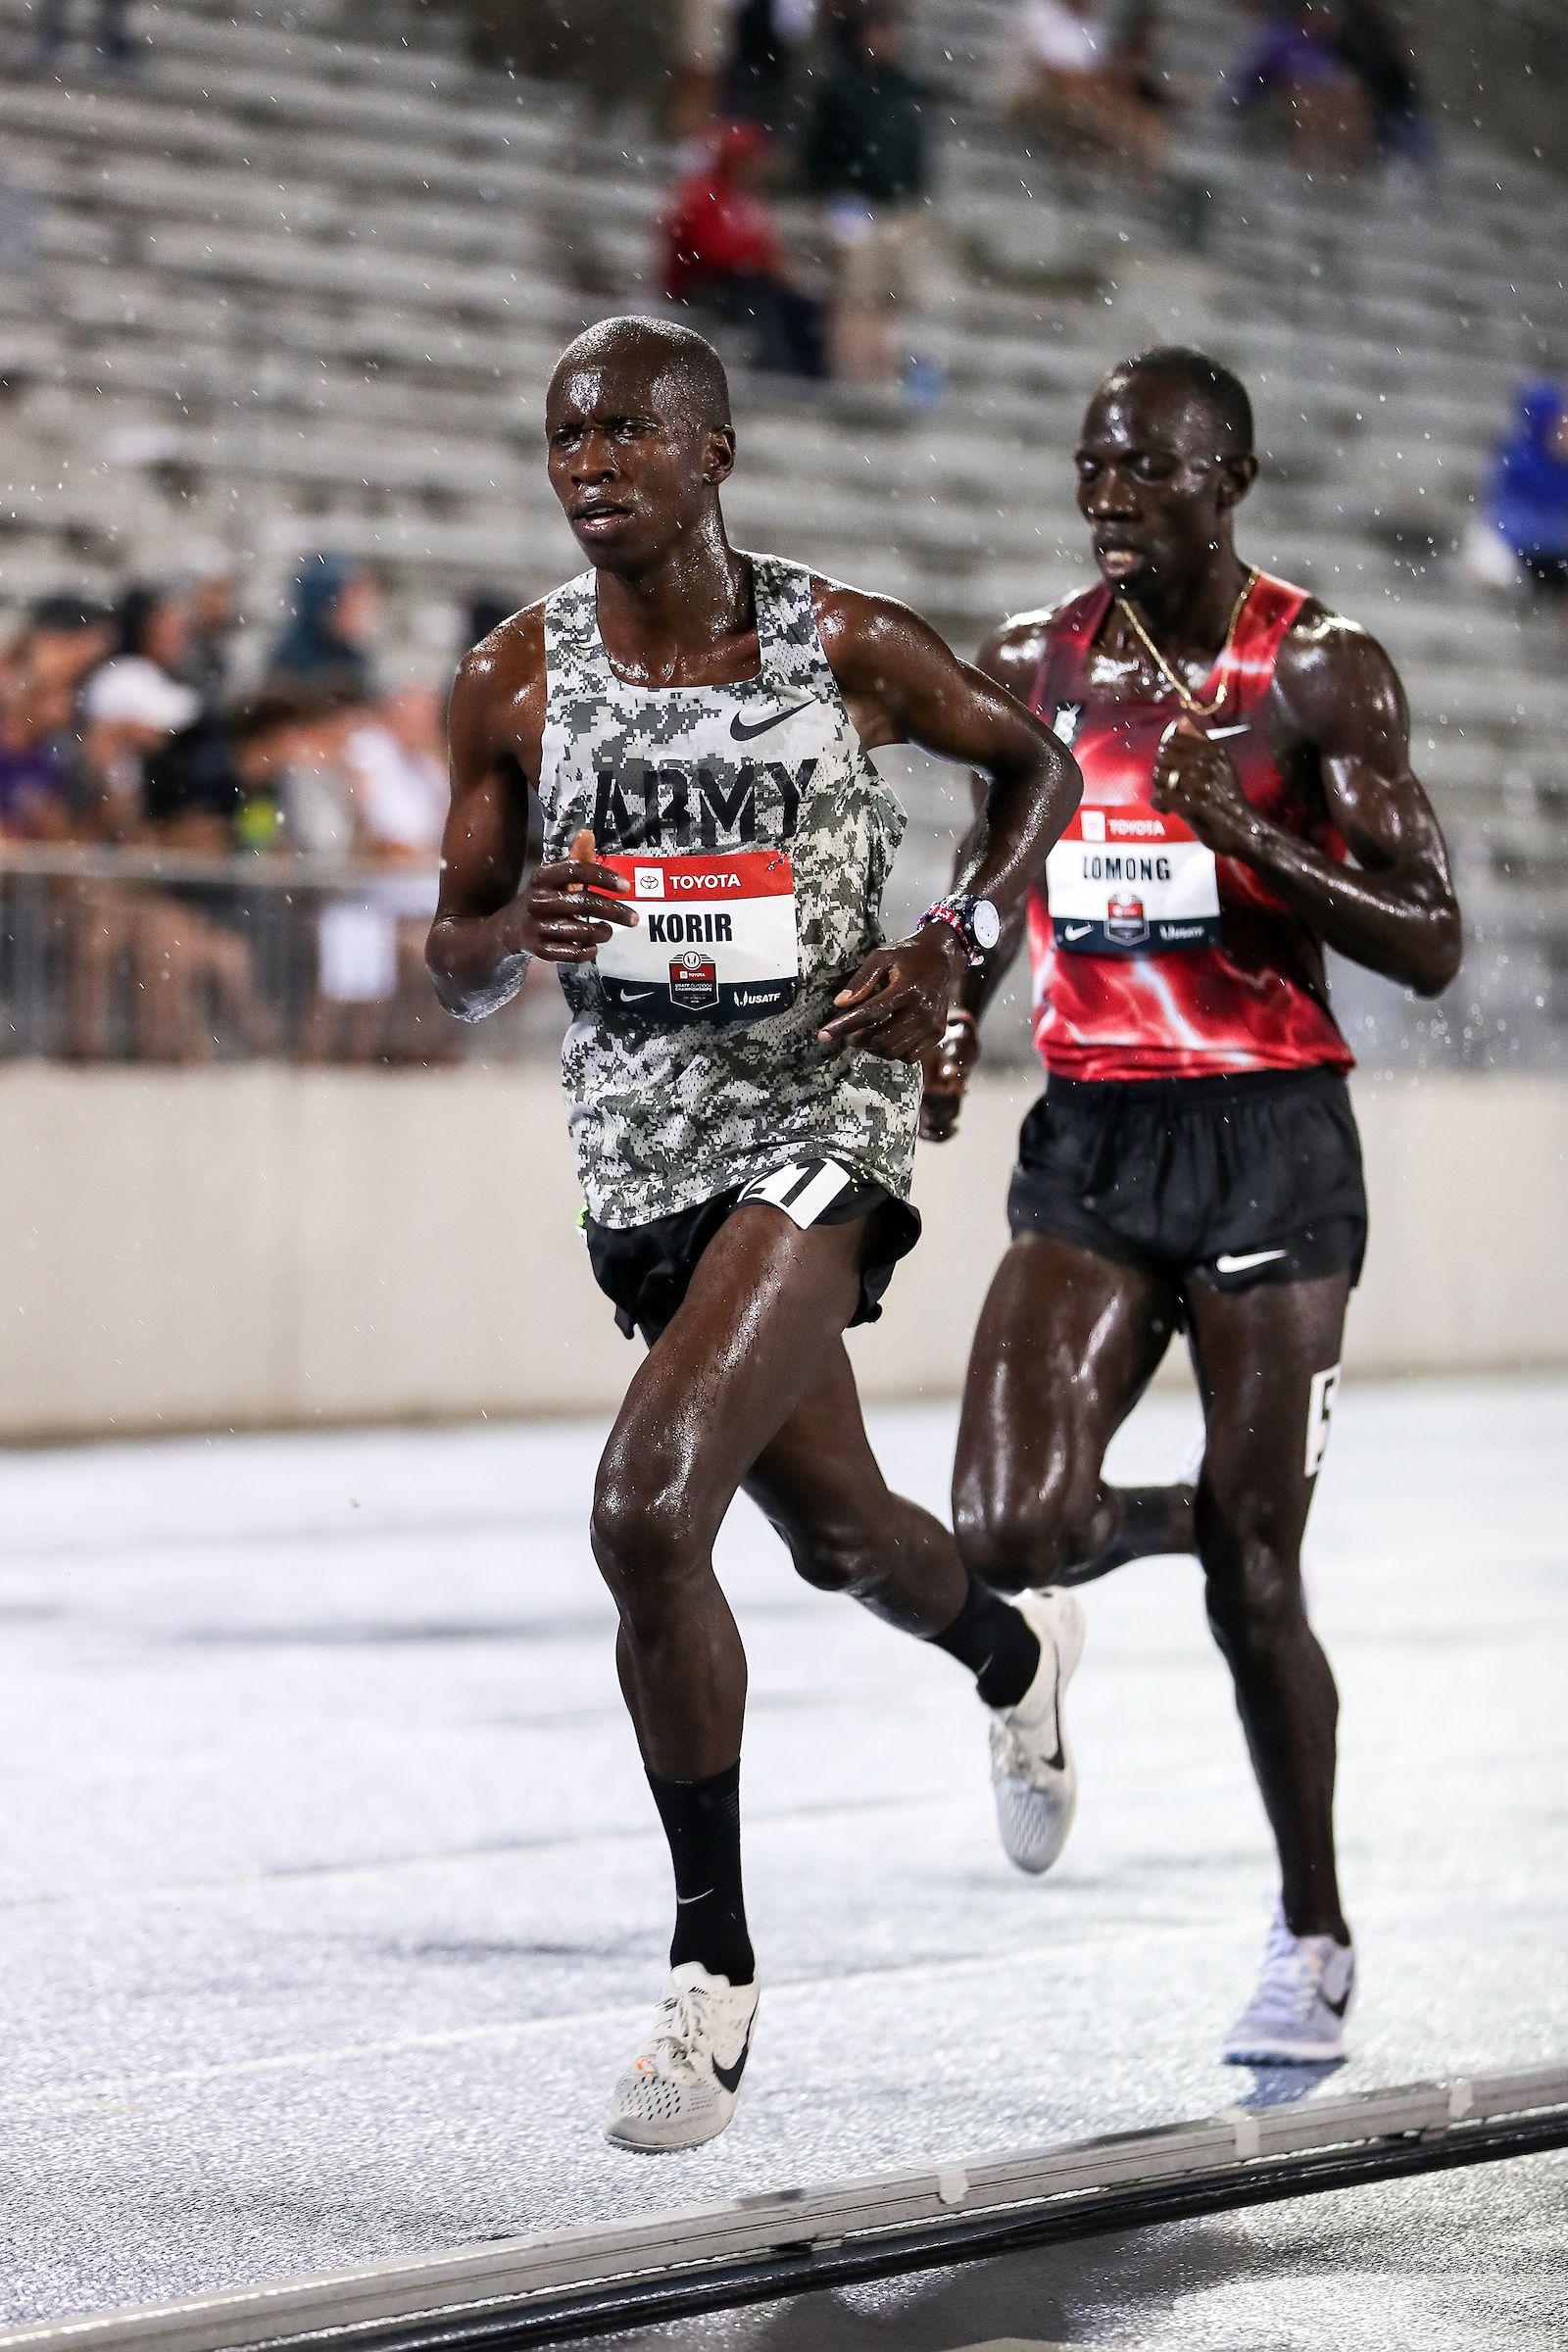 Leonard Korir Runs Fastest Marathon Debut by an American